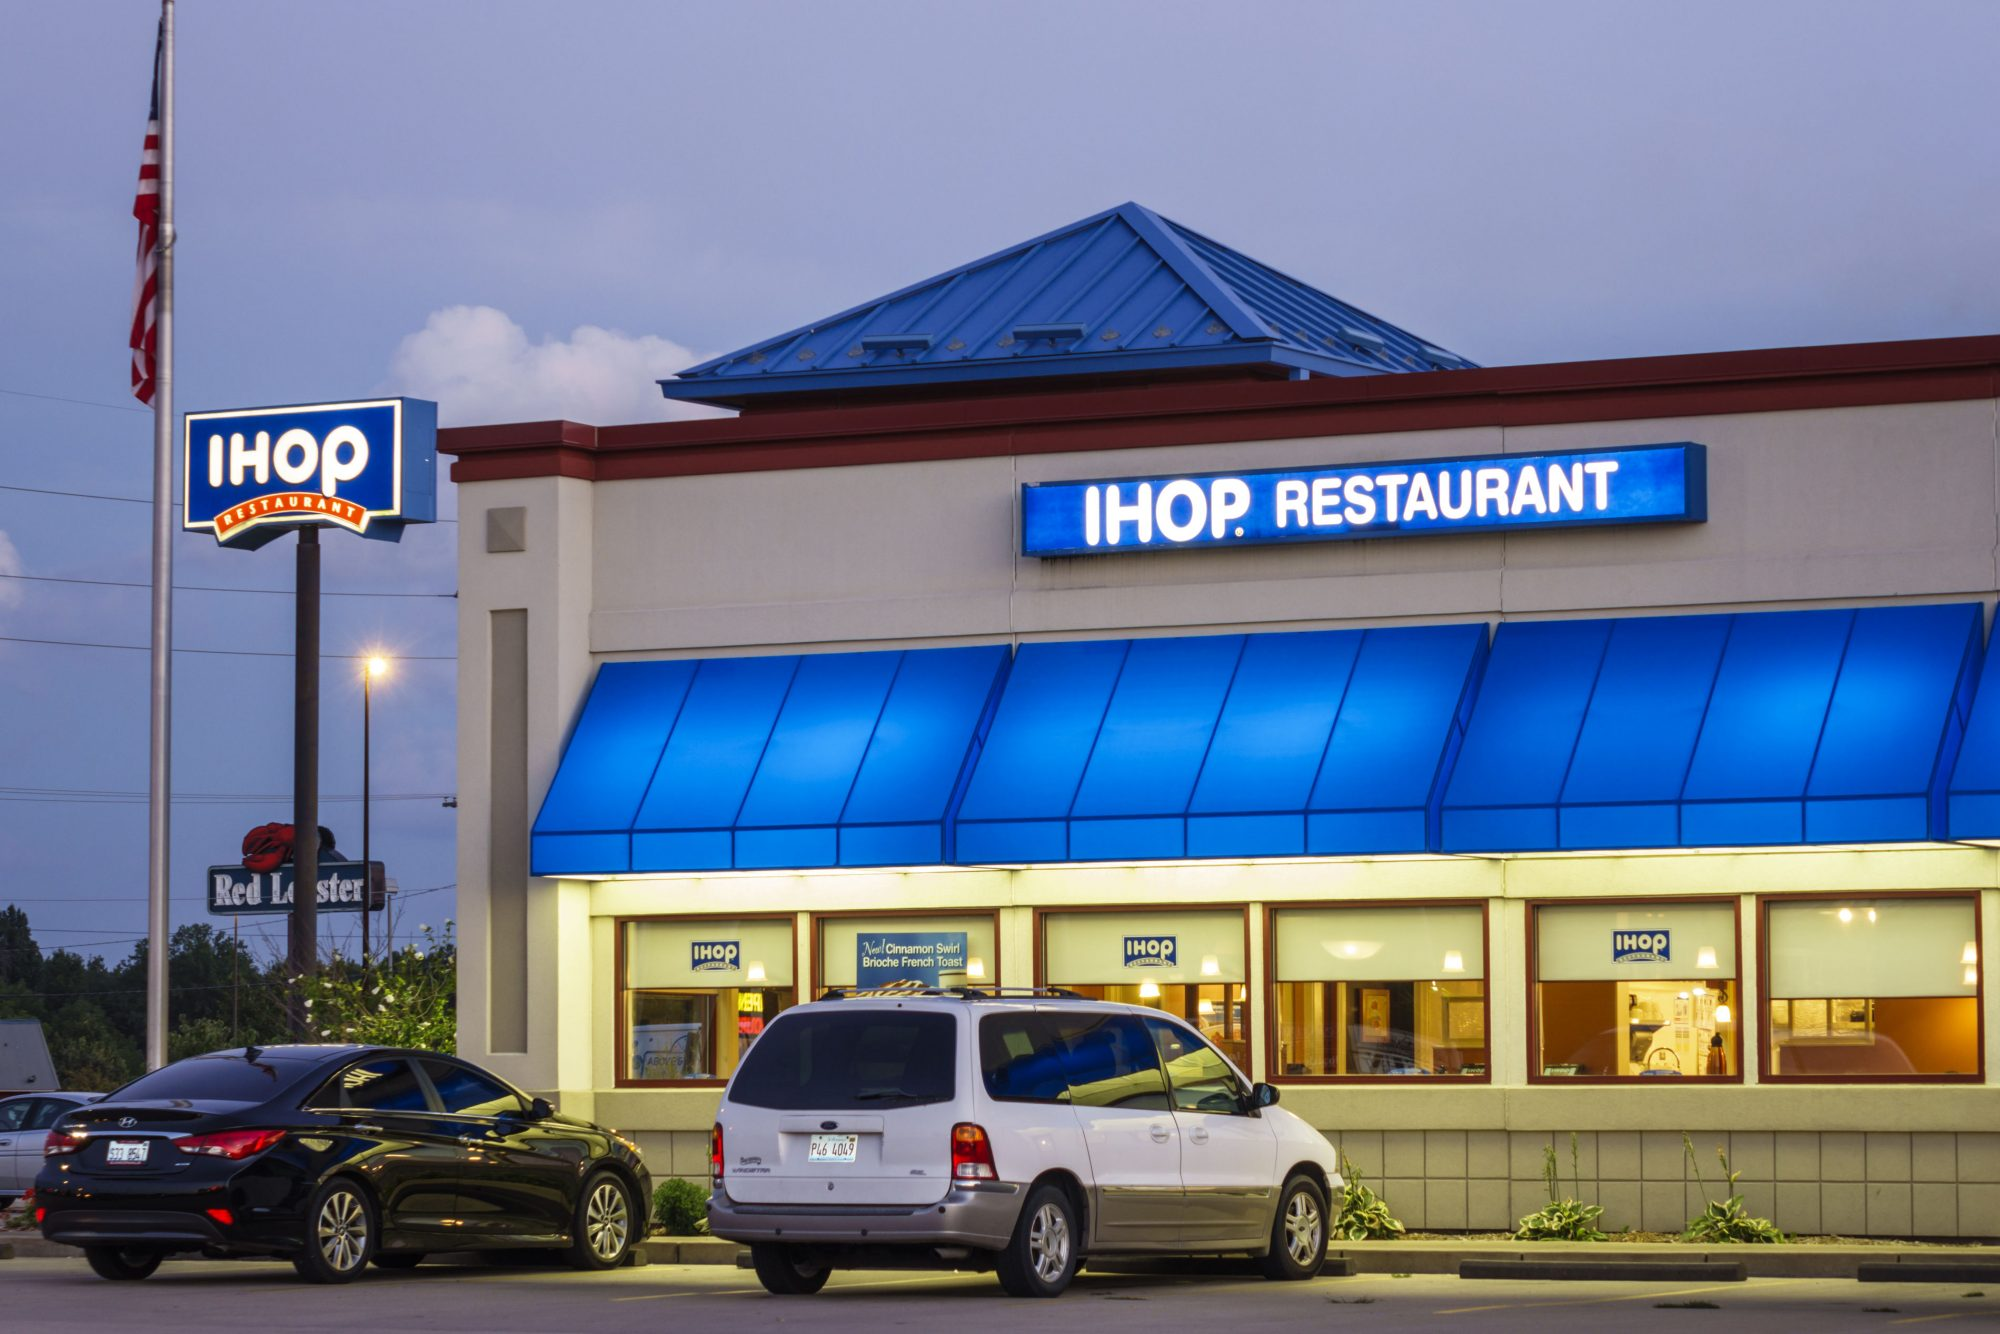 IHOP restaurant exterior at night.